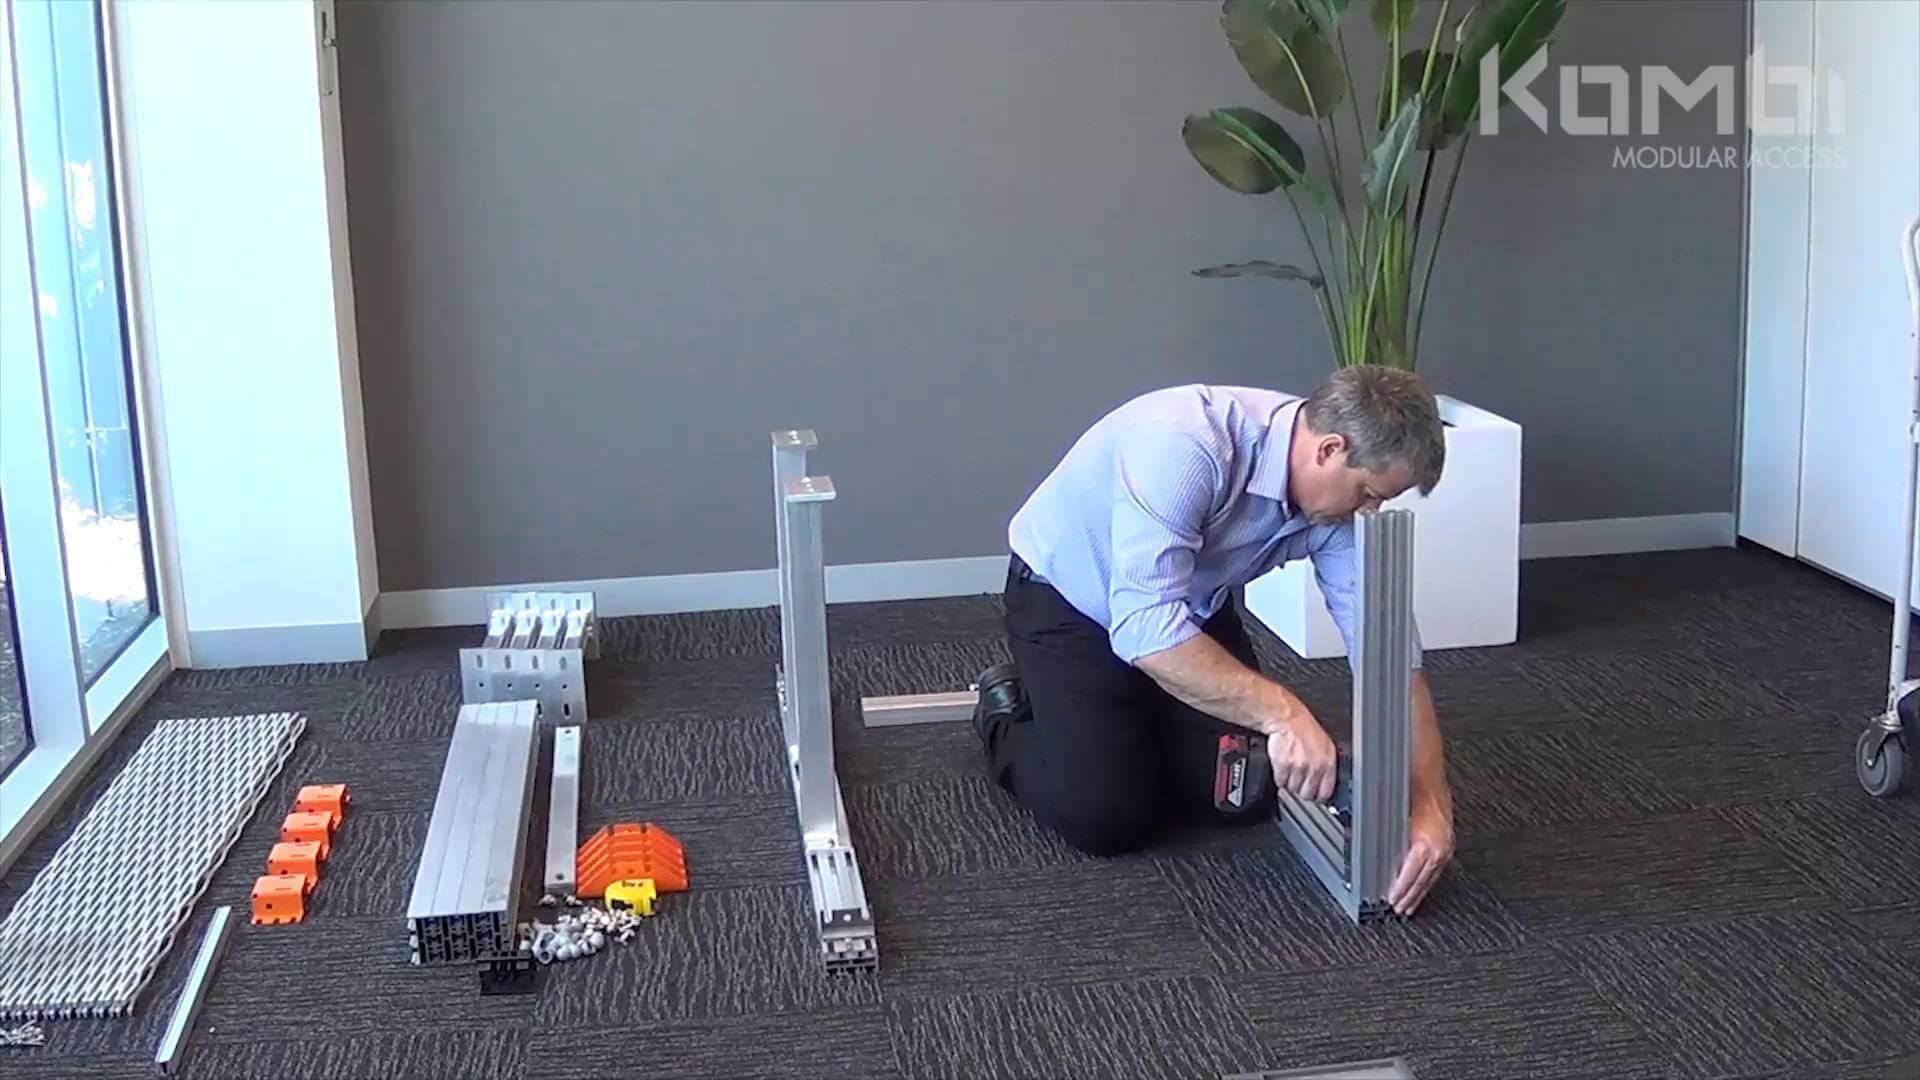 Kombi Stair & Platform Webinar 2 - Assembling the post supports & platform - click to view video